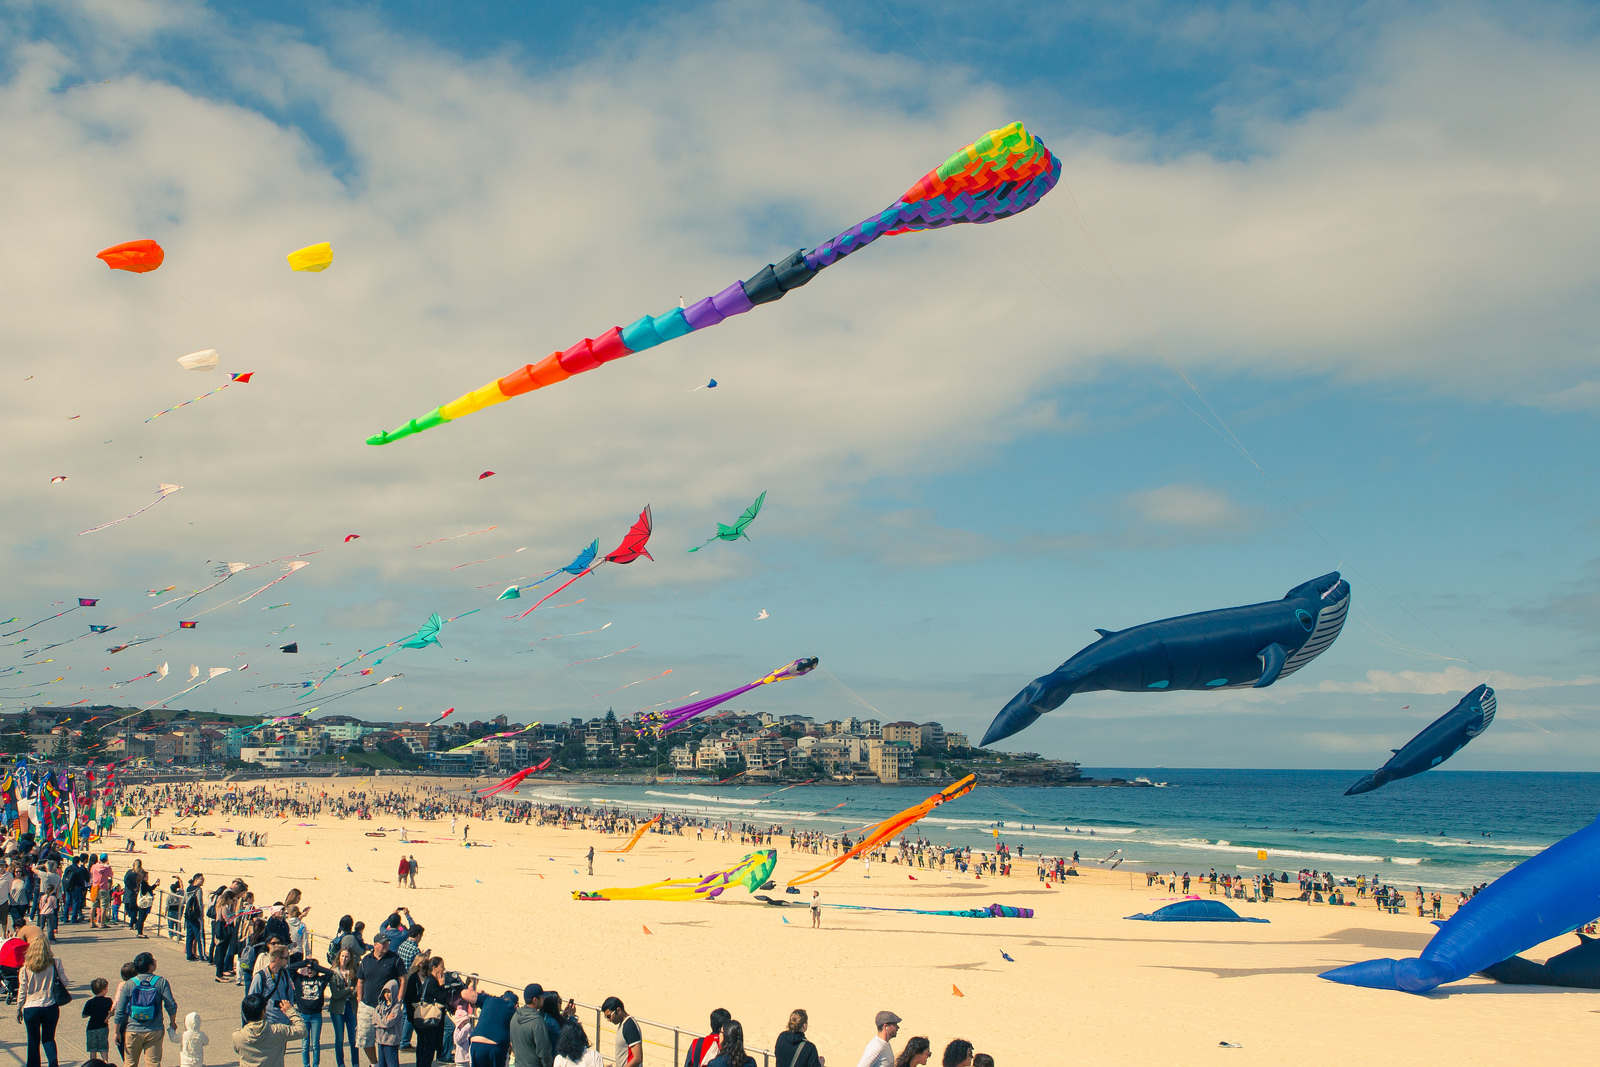 Festival of the Winds at Bondi, Sydney